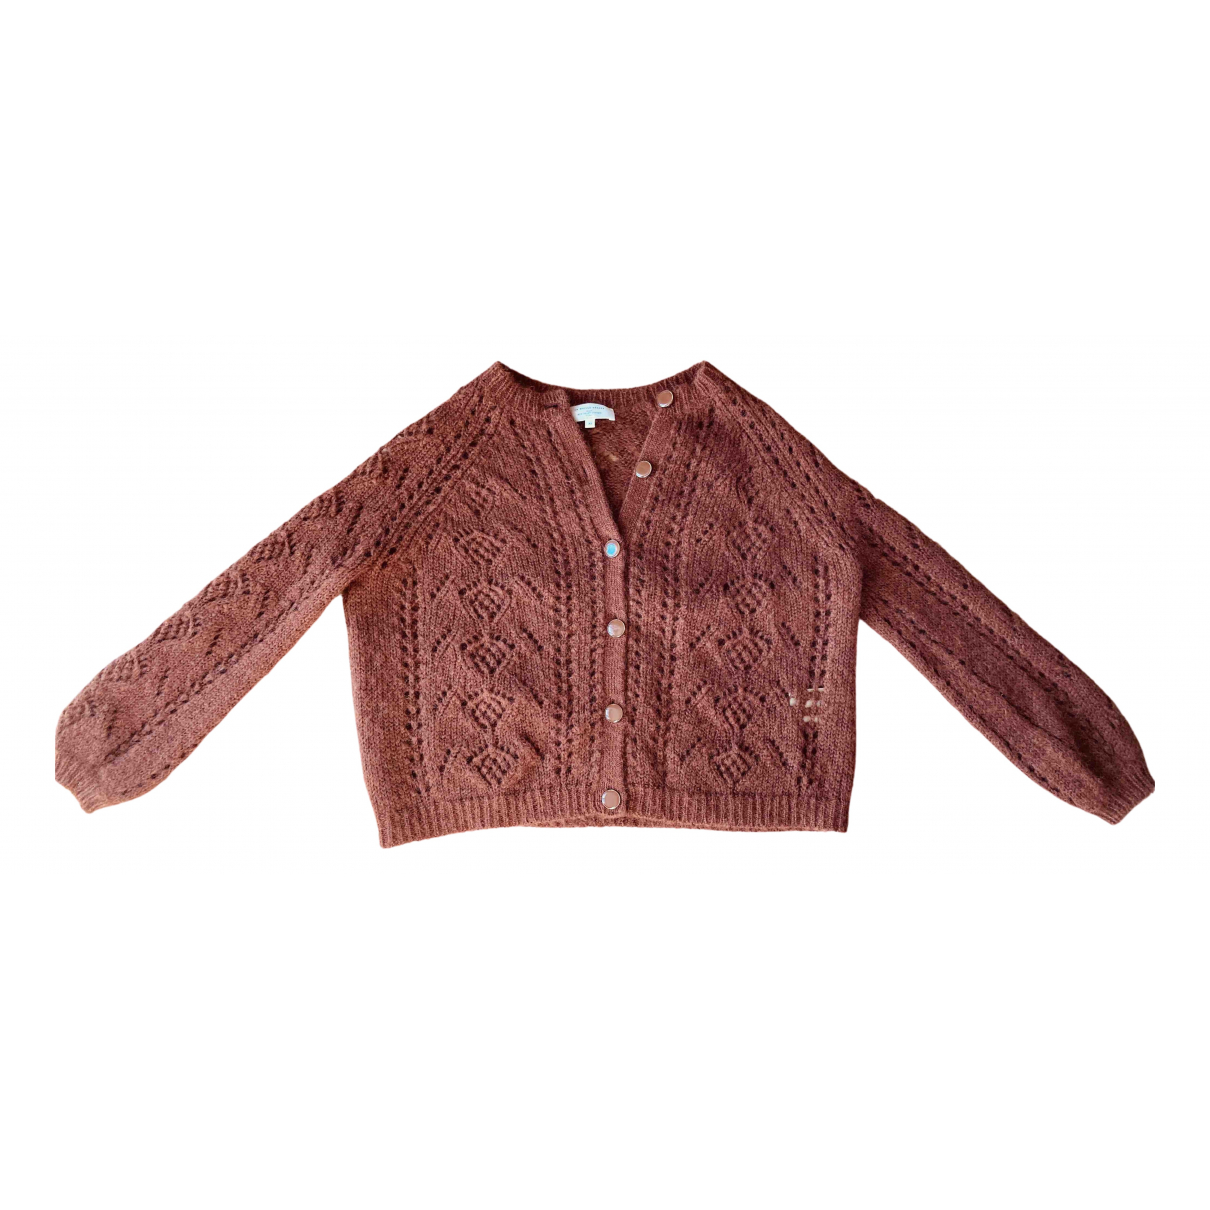 Sezane - Pull Fall Winter 2019 pour femme en laine - marron